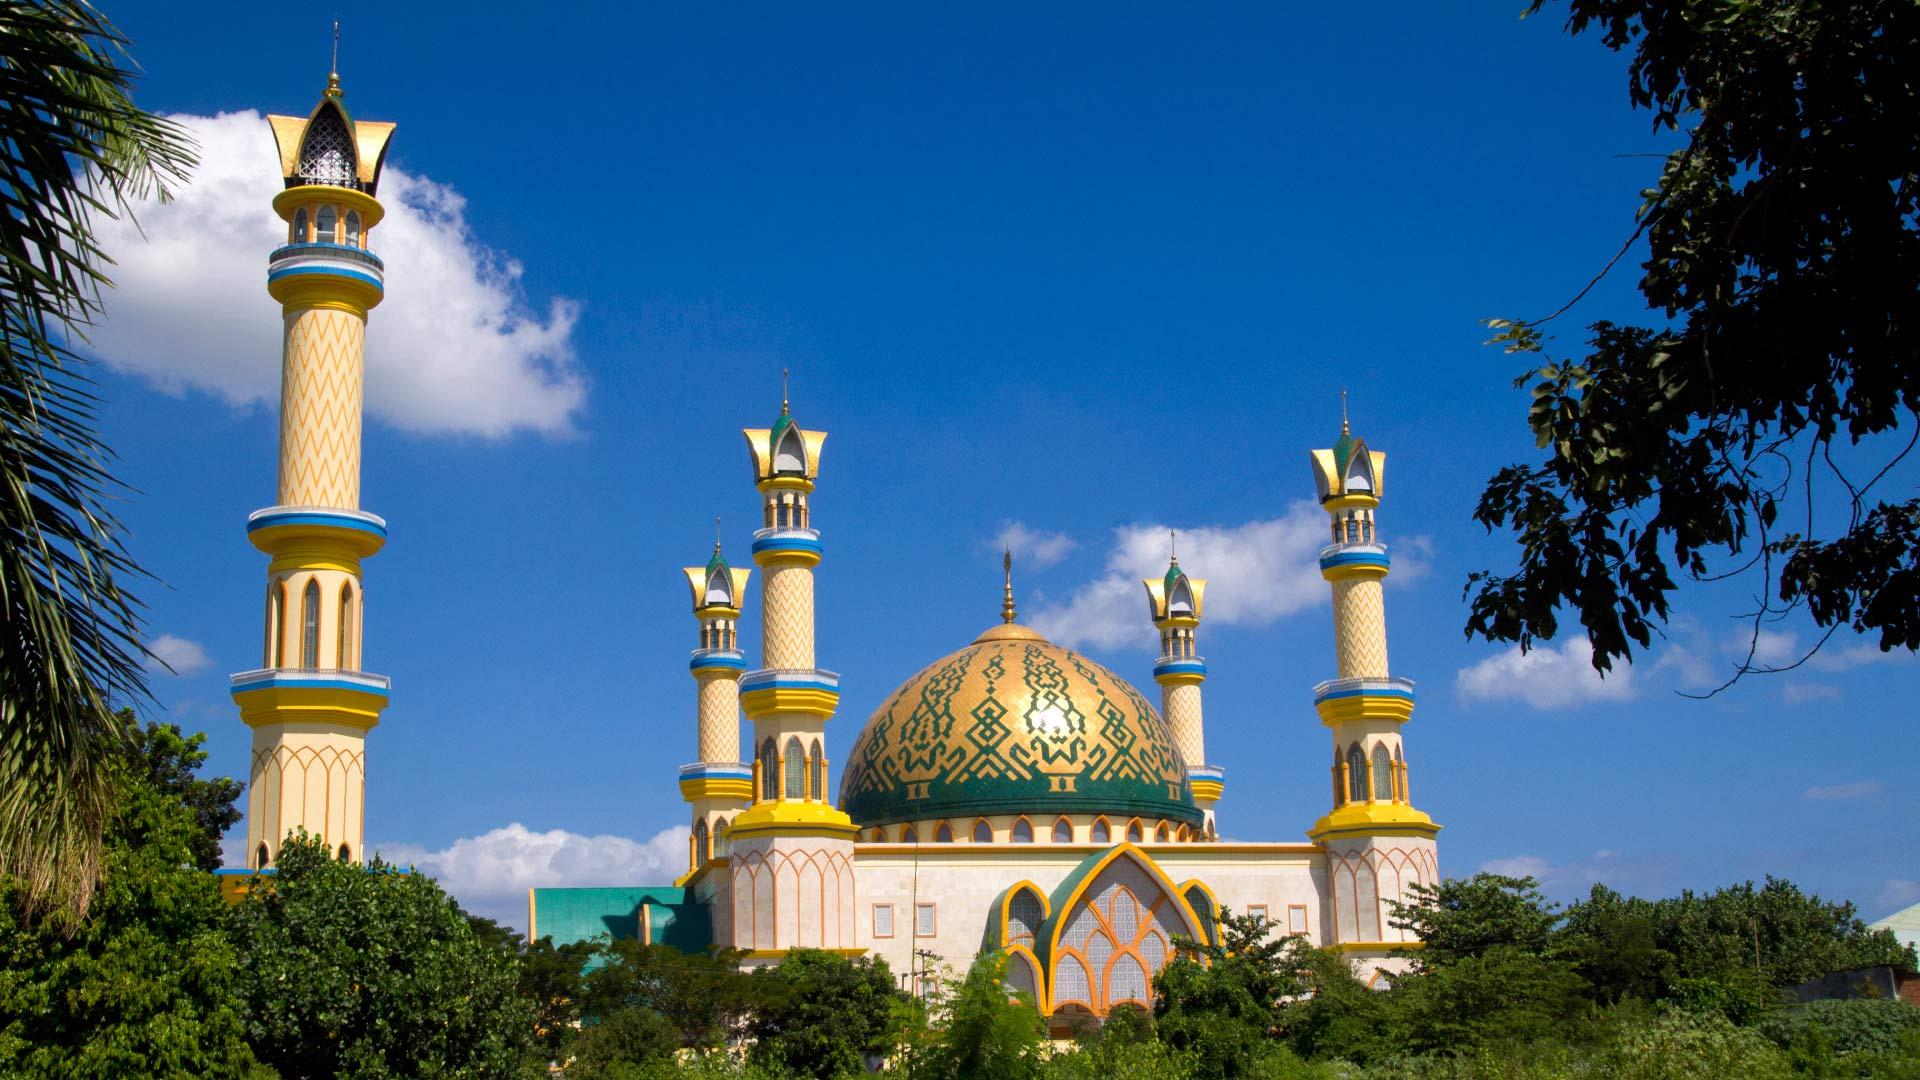 Berwisata Religi Pulau Seribu Masjid Islamic Center Kota Mataram Raya